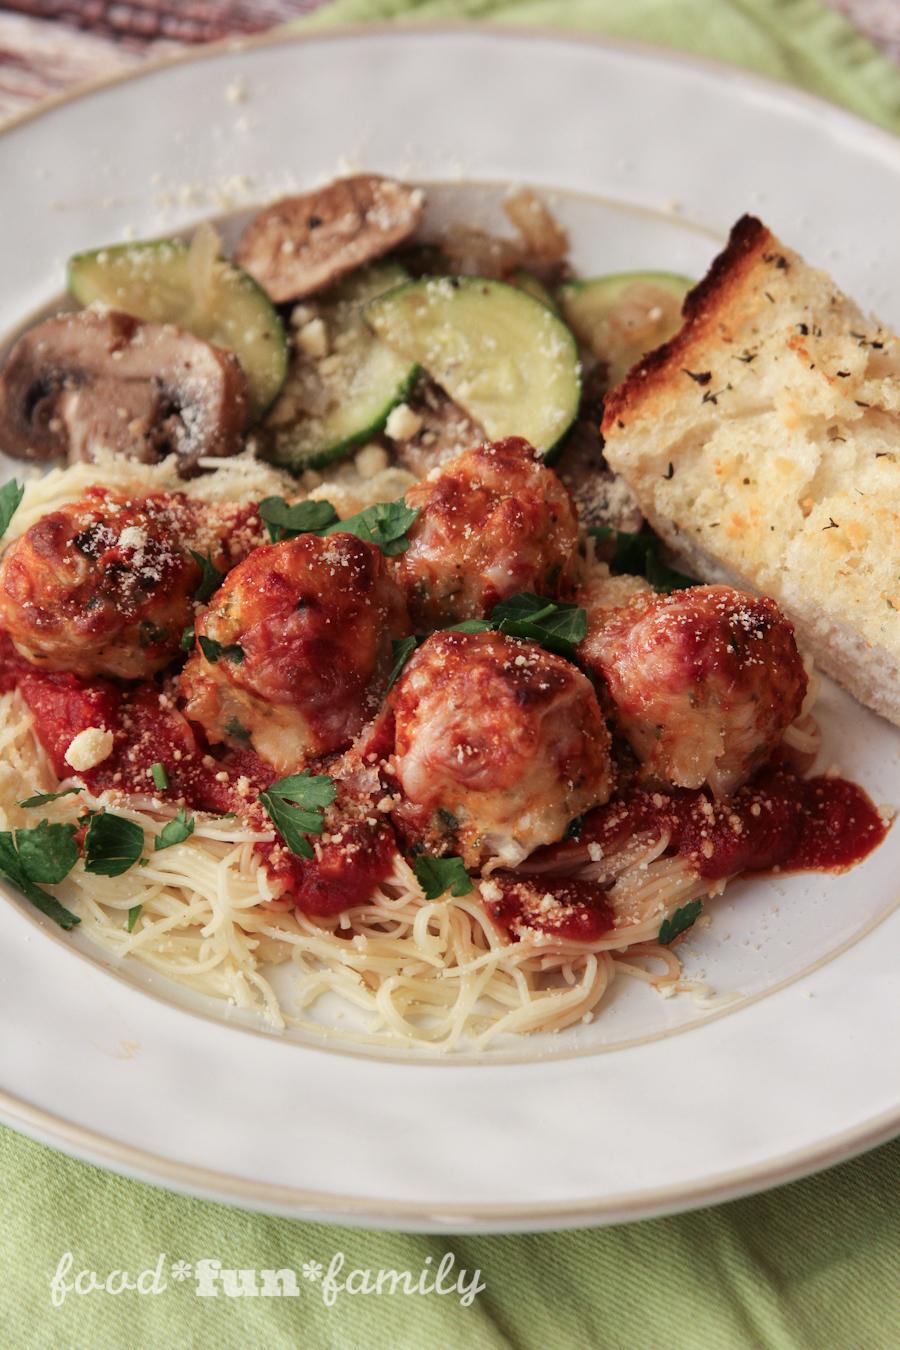 http://foodfunfamily.com/wp-content/uploads/2016/08/Chicken-Parmesan-Meatballs-11.jpg